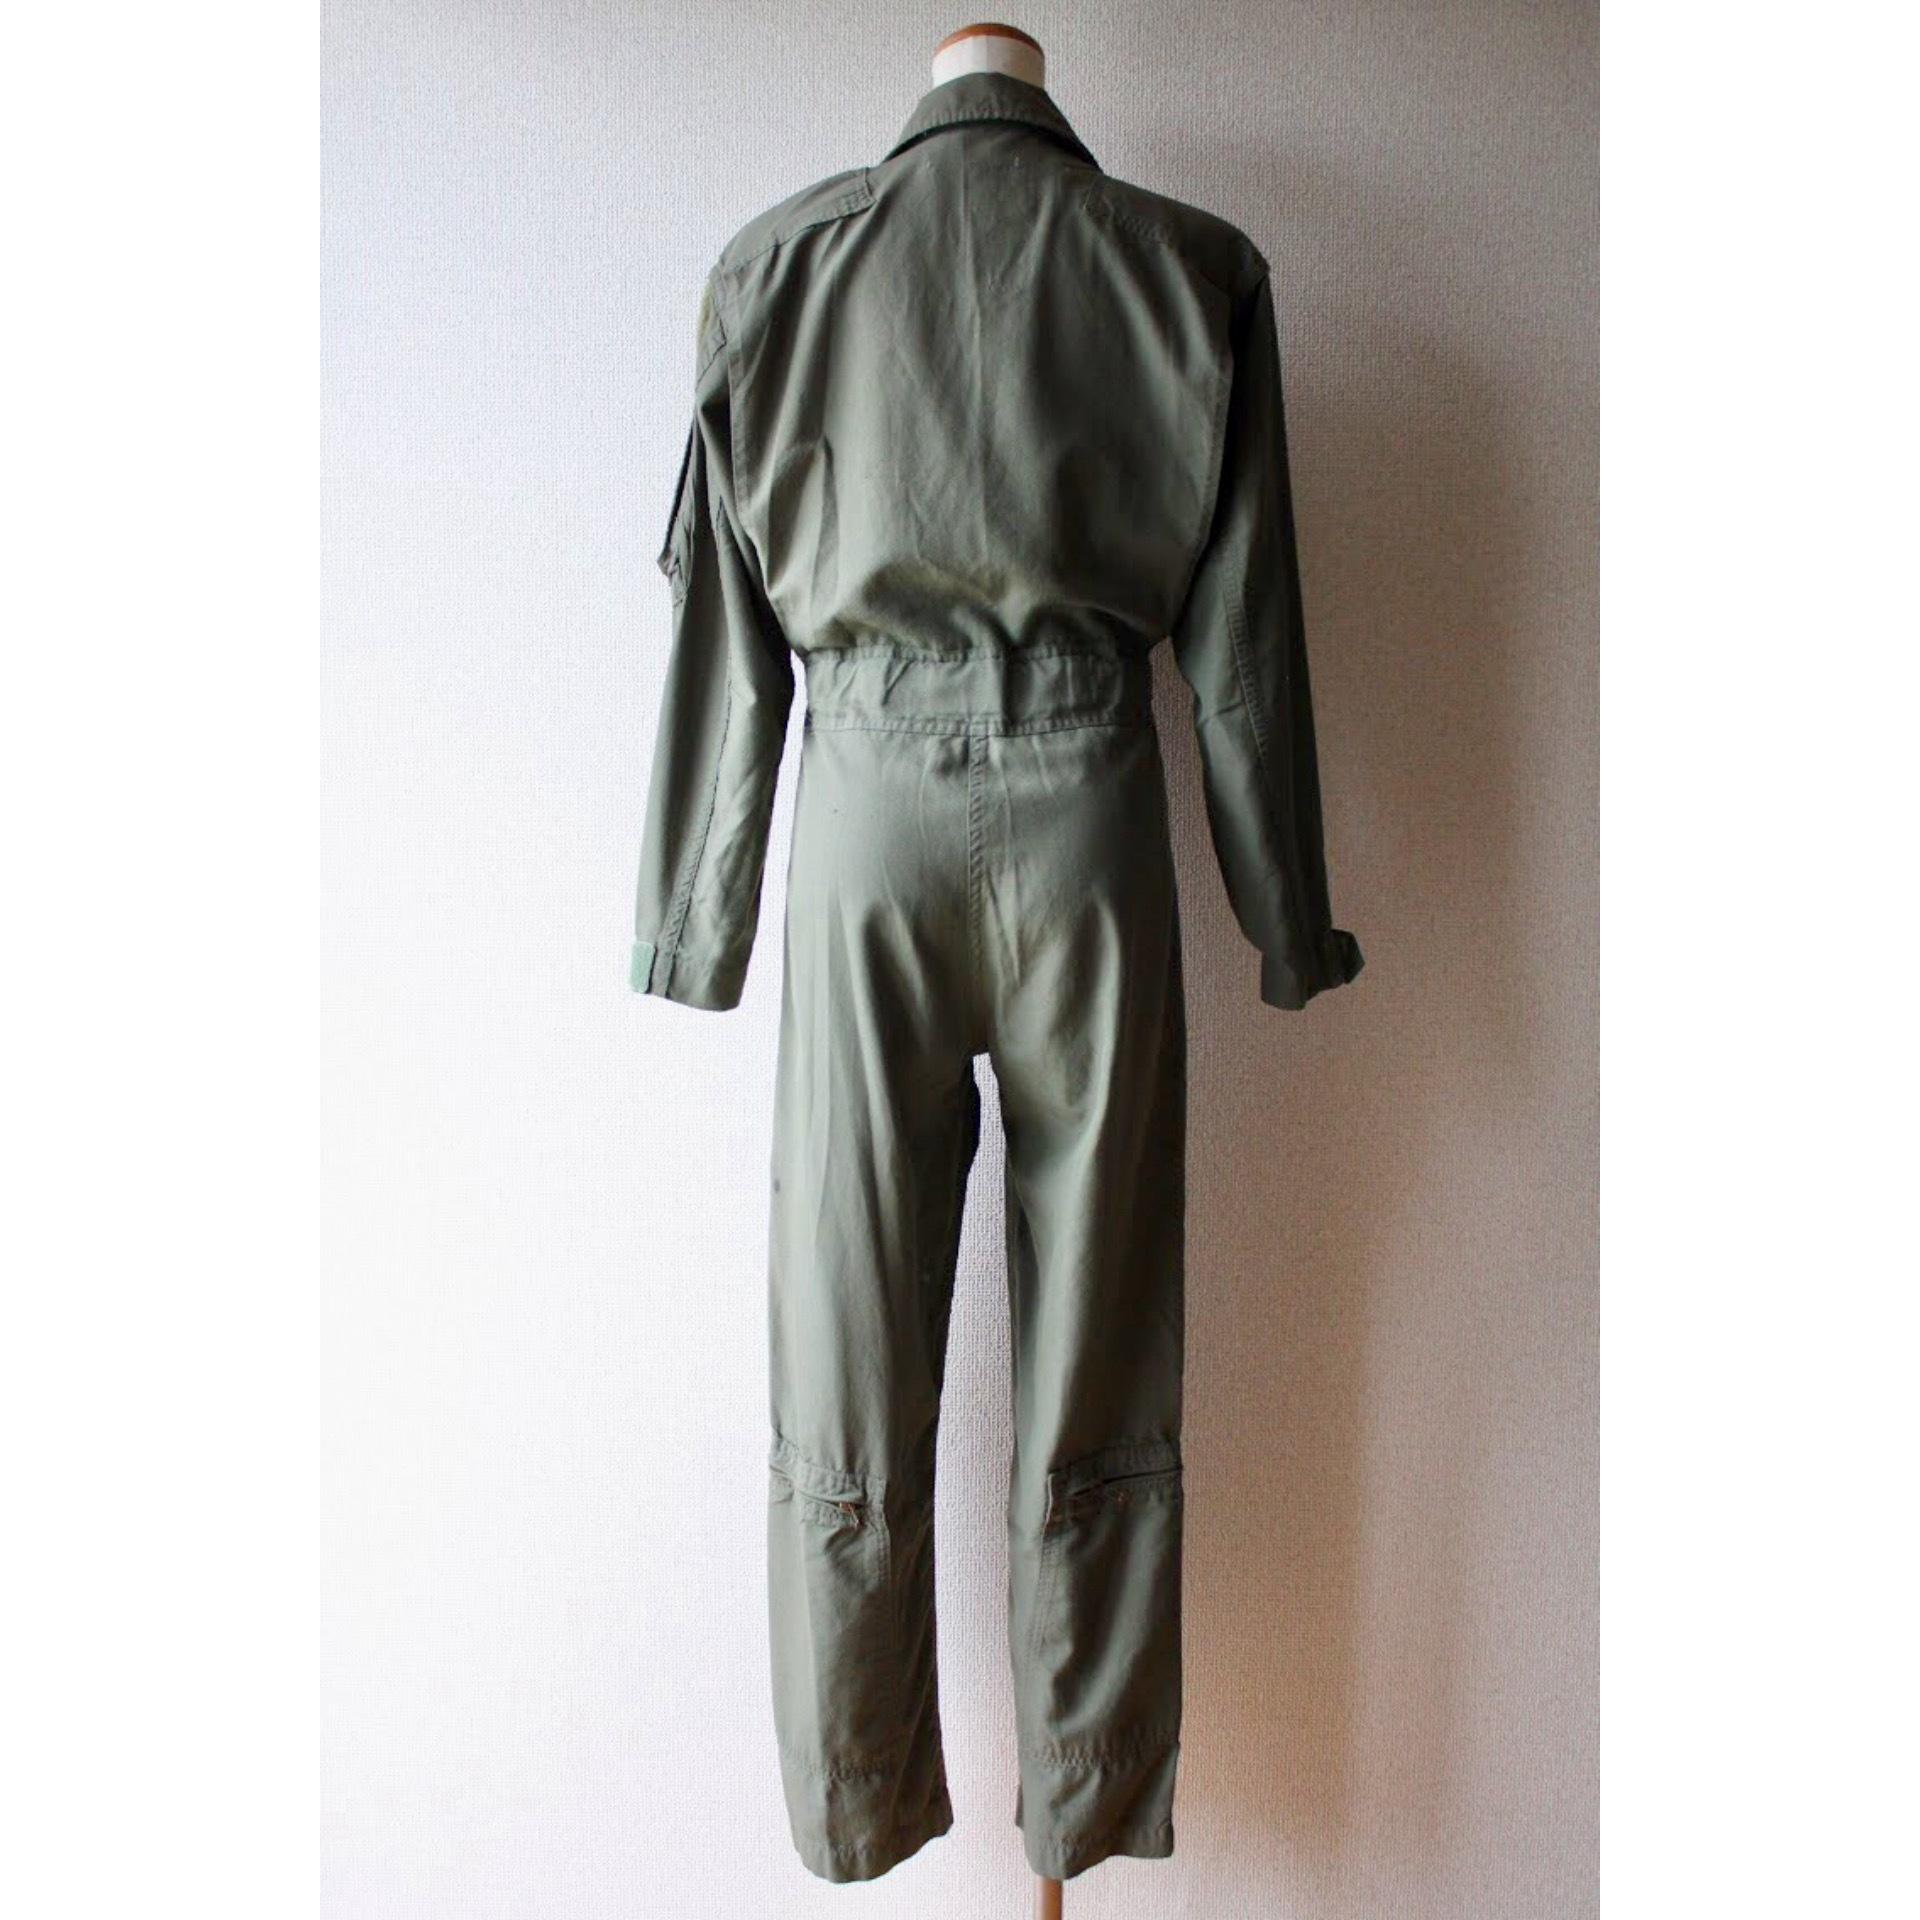 Vintage military flight suit